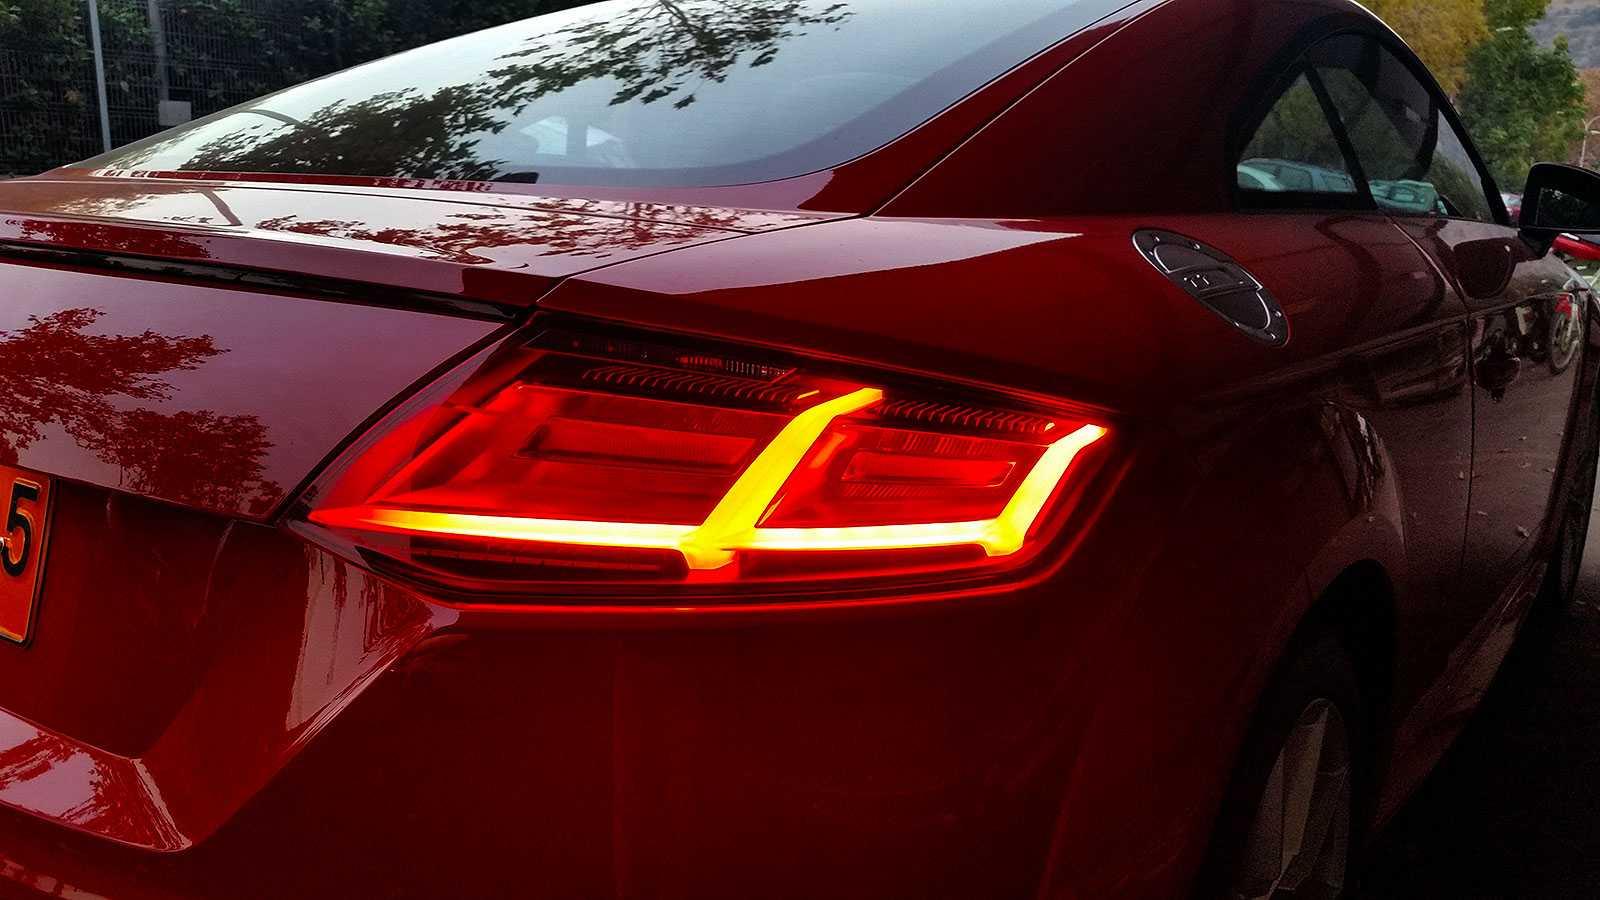 Audi TT 2.0 TFSi 230 CV Stronic Coupé 2015 Test Drive Rutamotor (2)